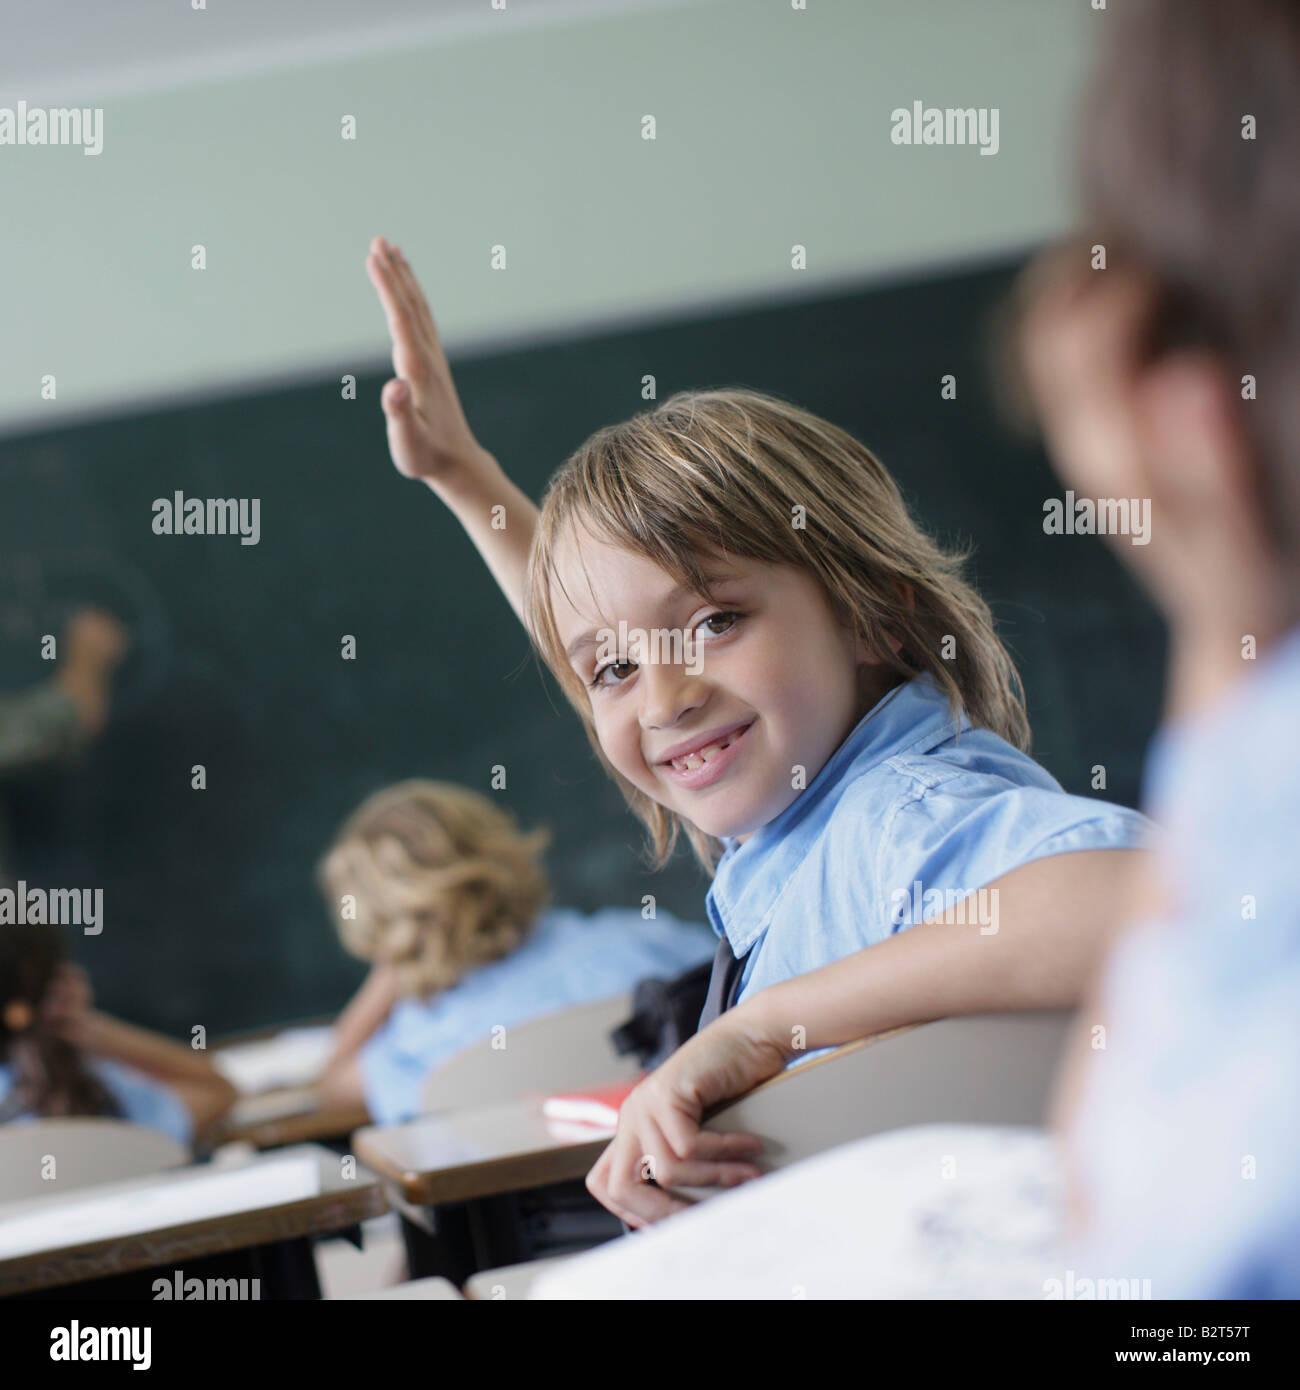 School boy raising hand in class Stock Photo